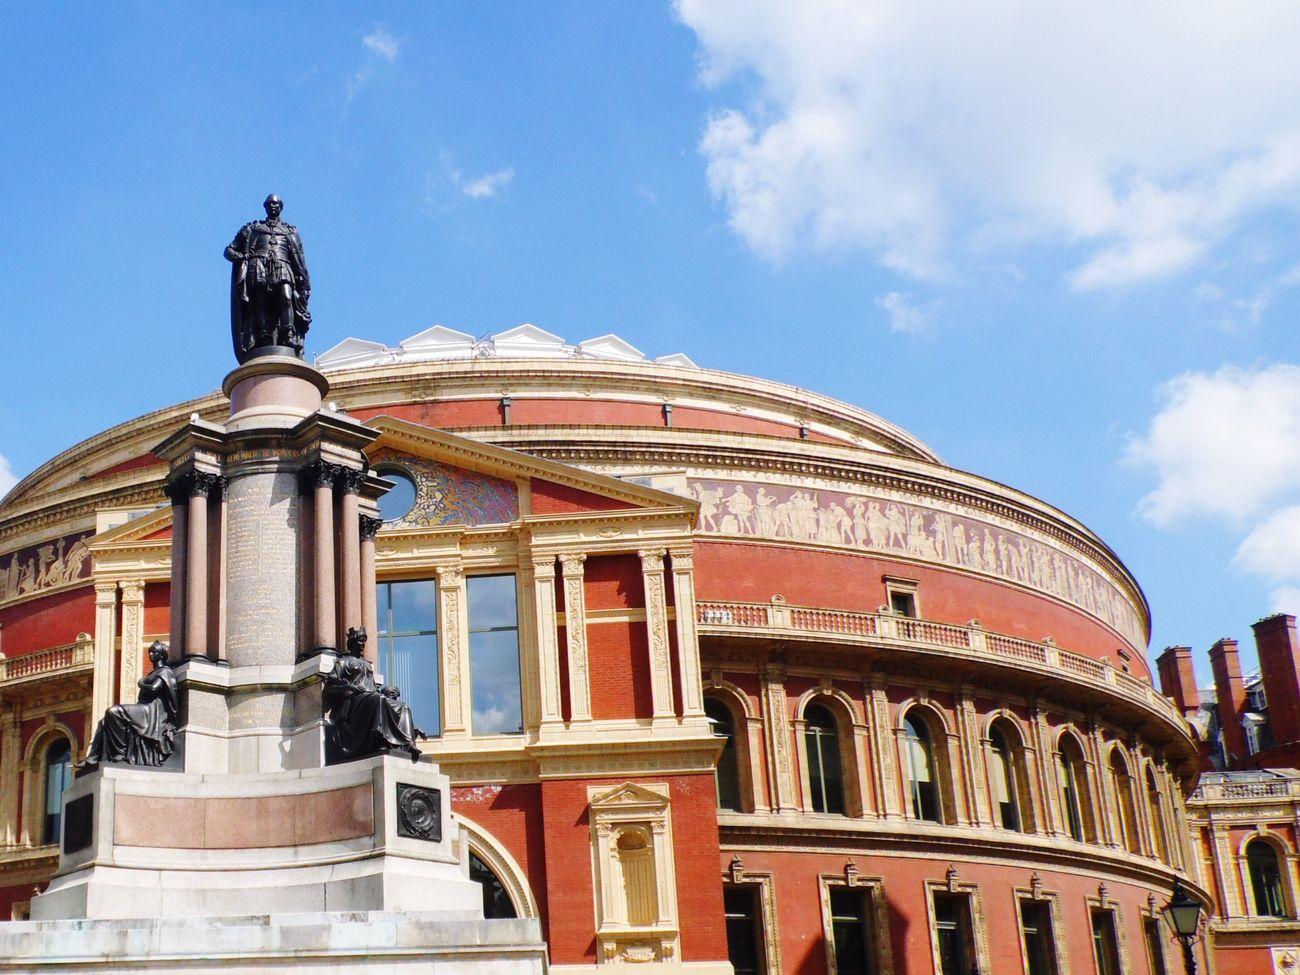 Love this place!!! Orange By Motorola Taking Photos Enjoying Life London Calling London Unitedkingdom Being A Tourist Londres